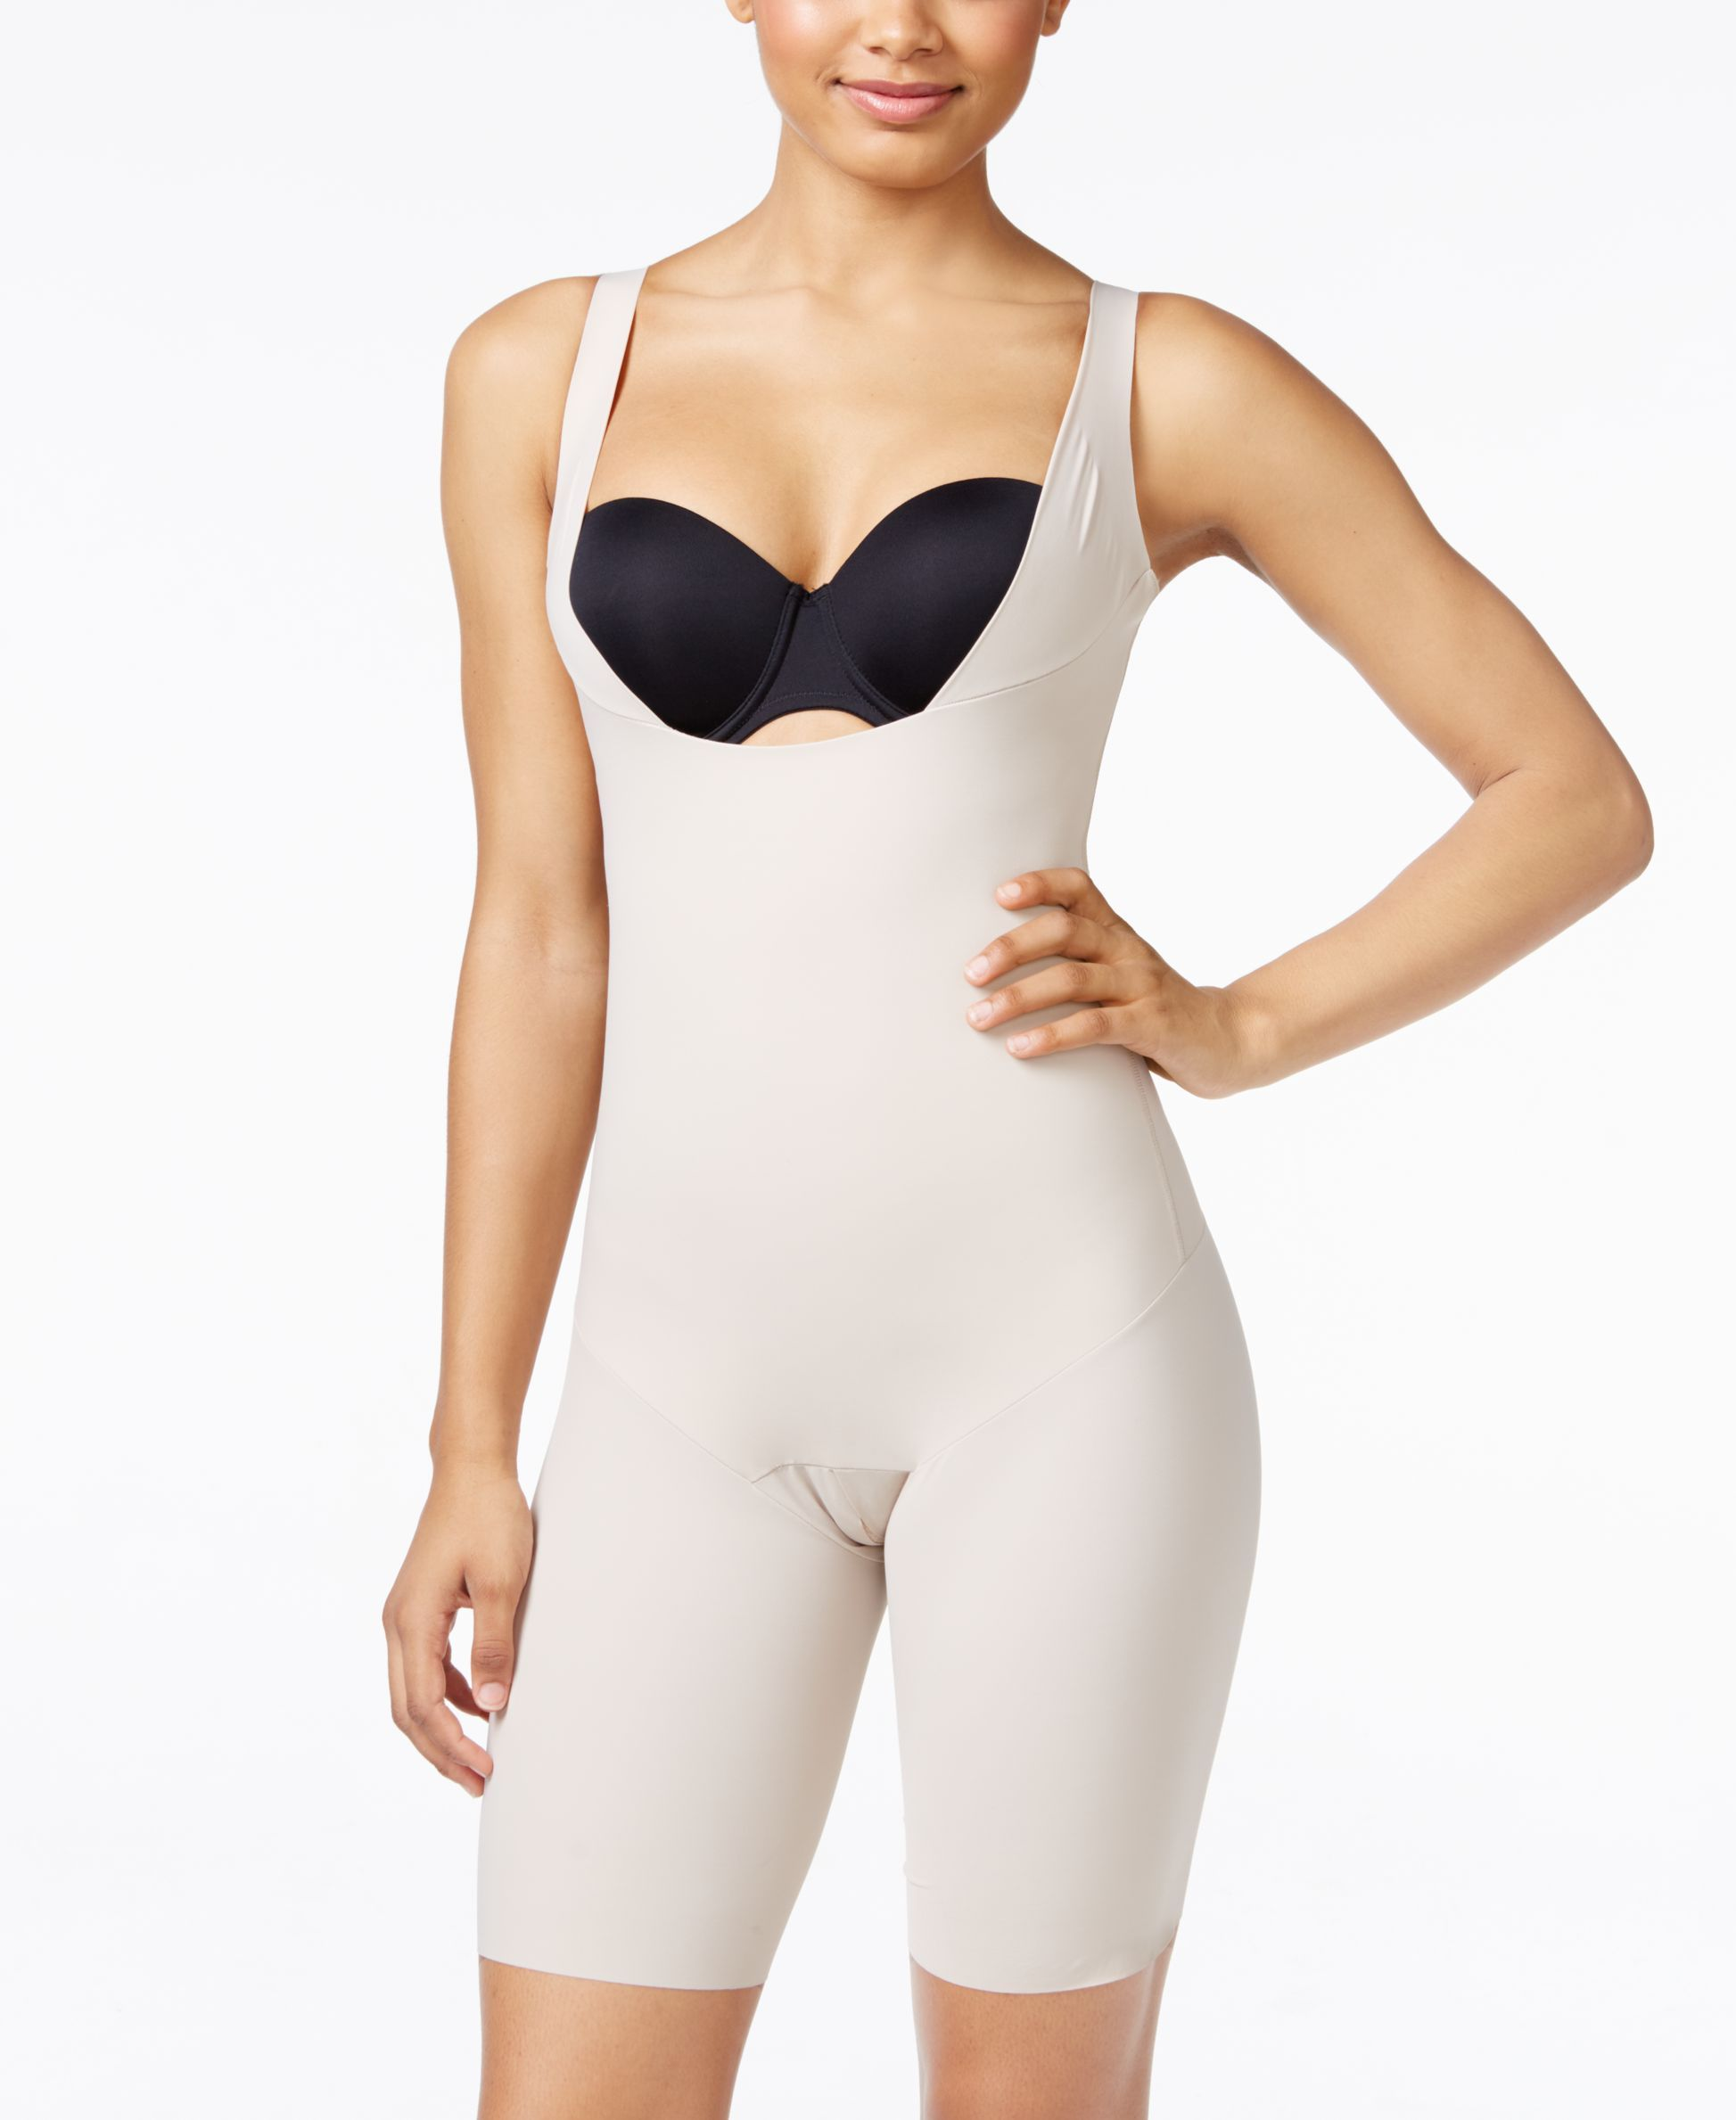 0f30c0c19 Women s Moderate Tummy-Control WYOB Smoothing Bodyshaper 018483 ...